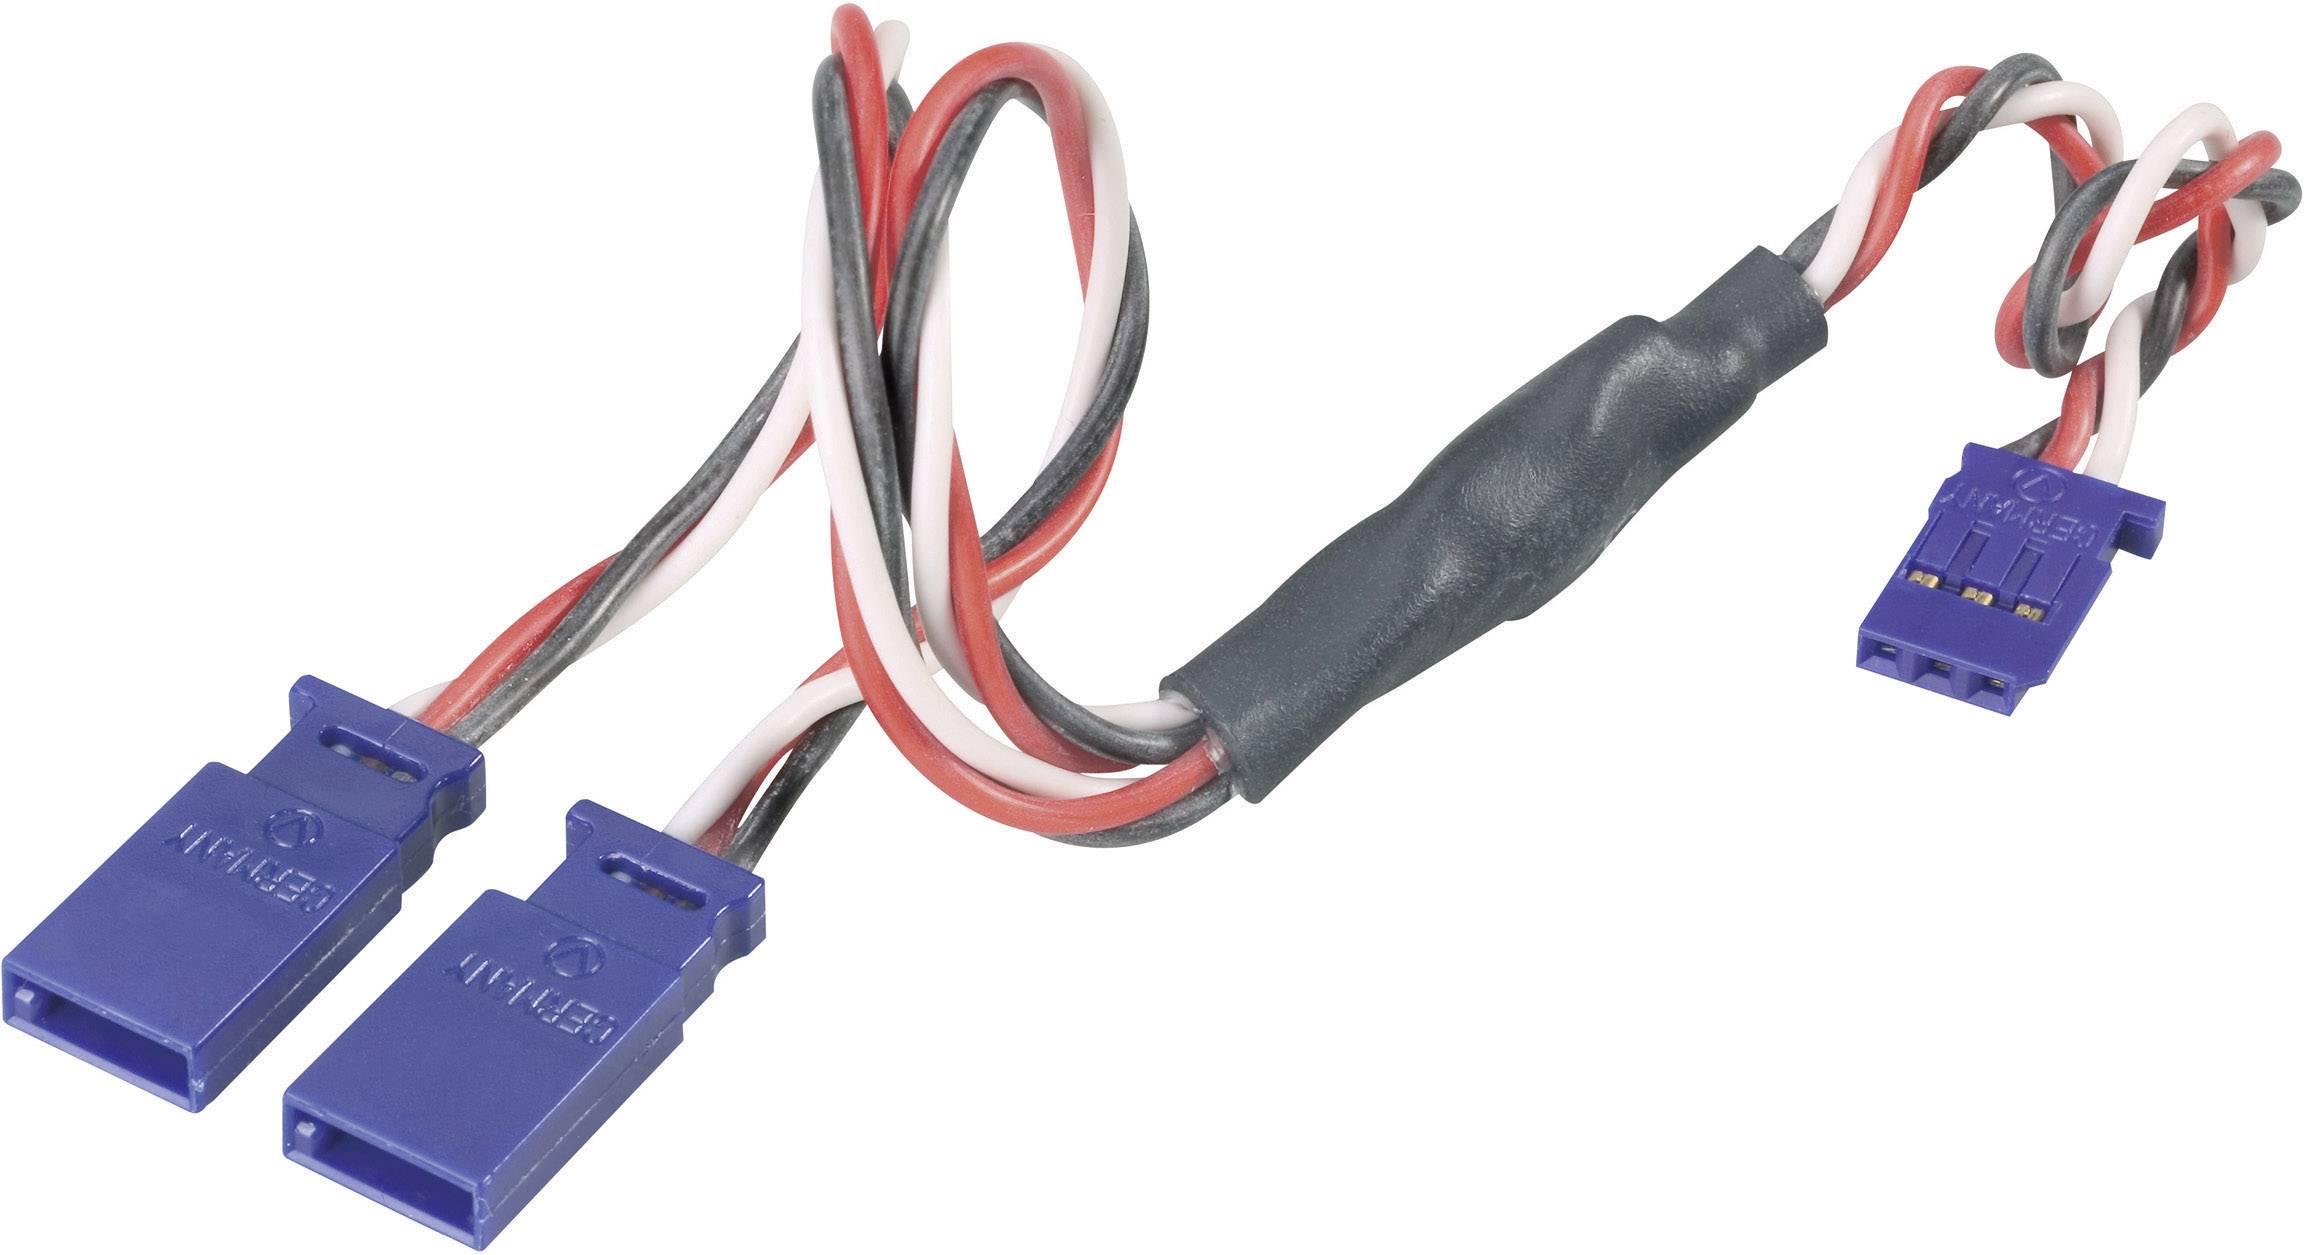 Y kabel Modelcraft, konektor Futaba, 30 cm, 0,35 mm²